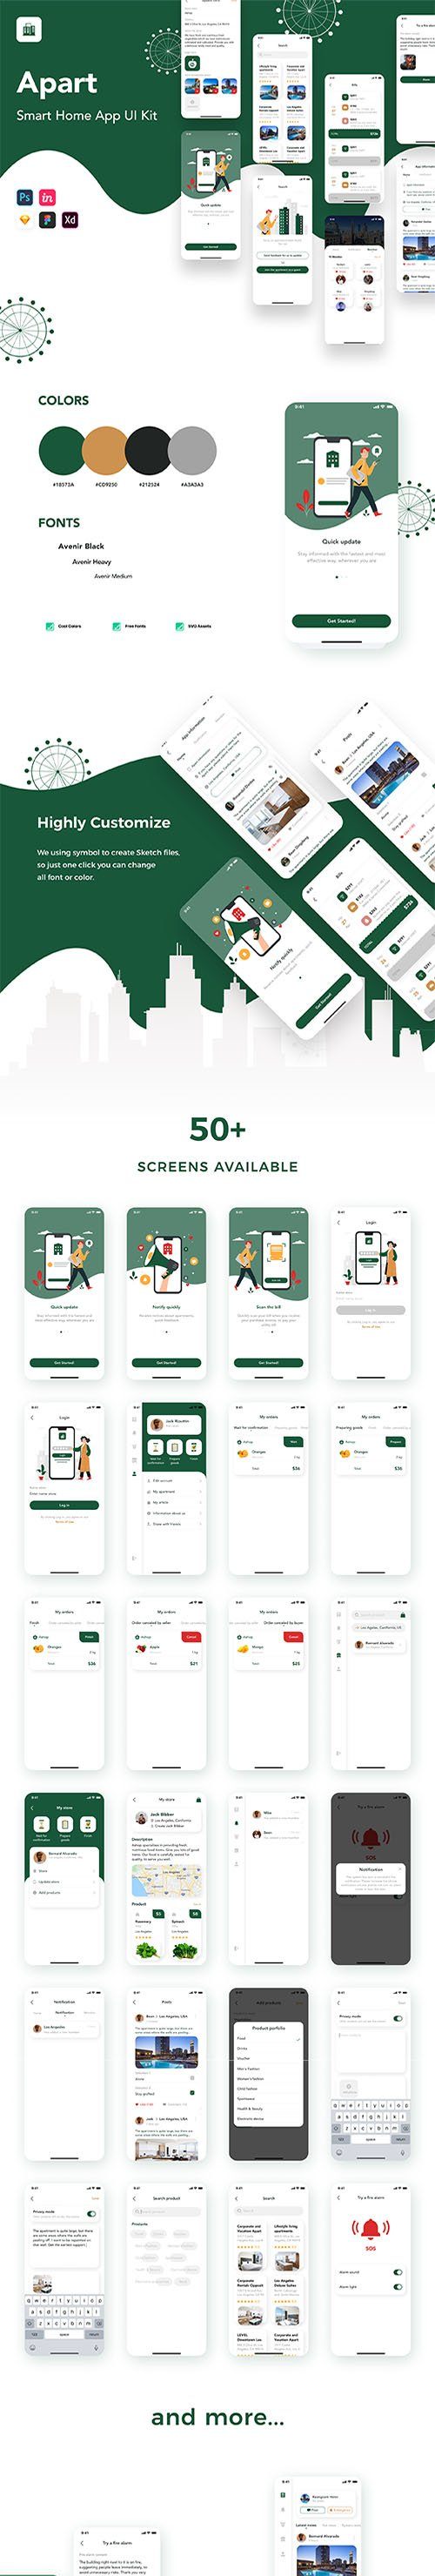 Apart - Smart Home App UI Kit